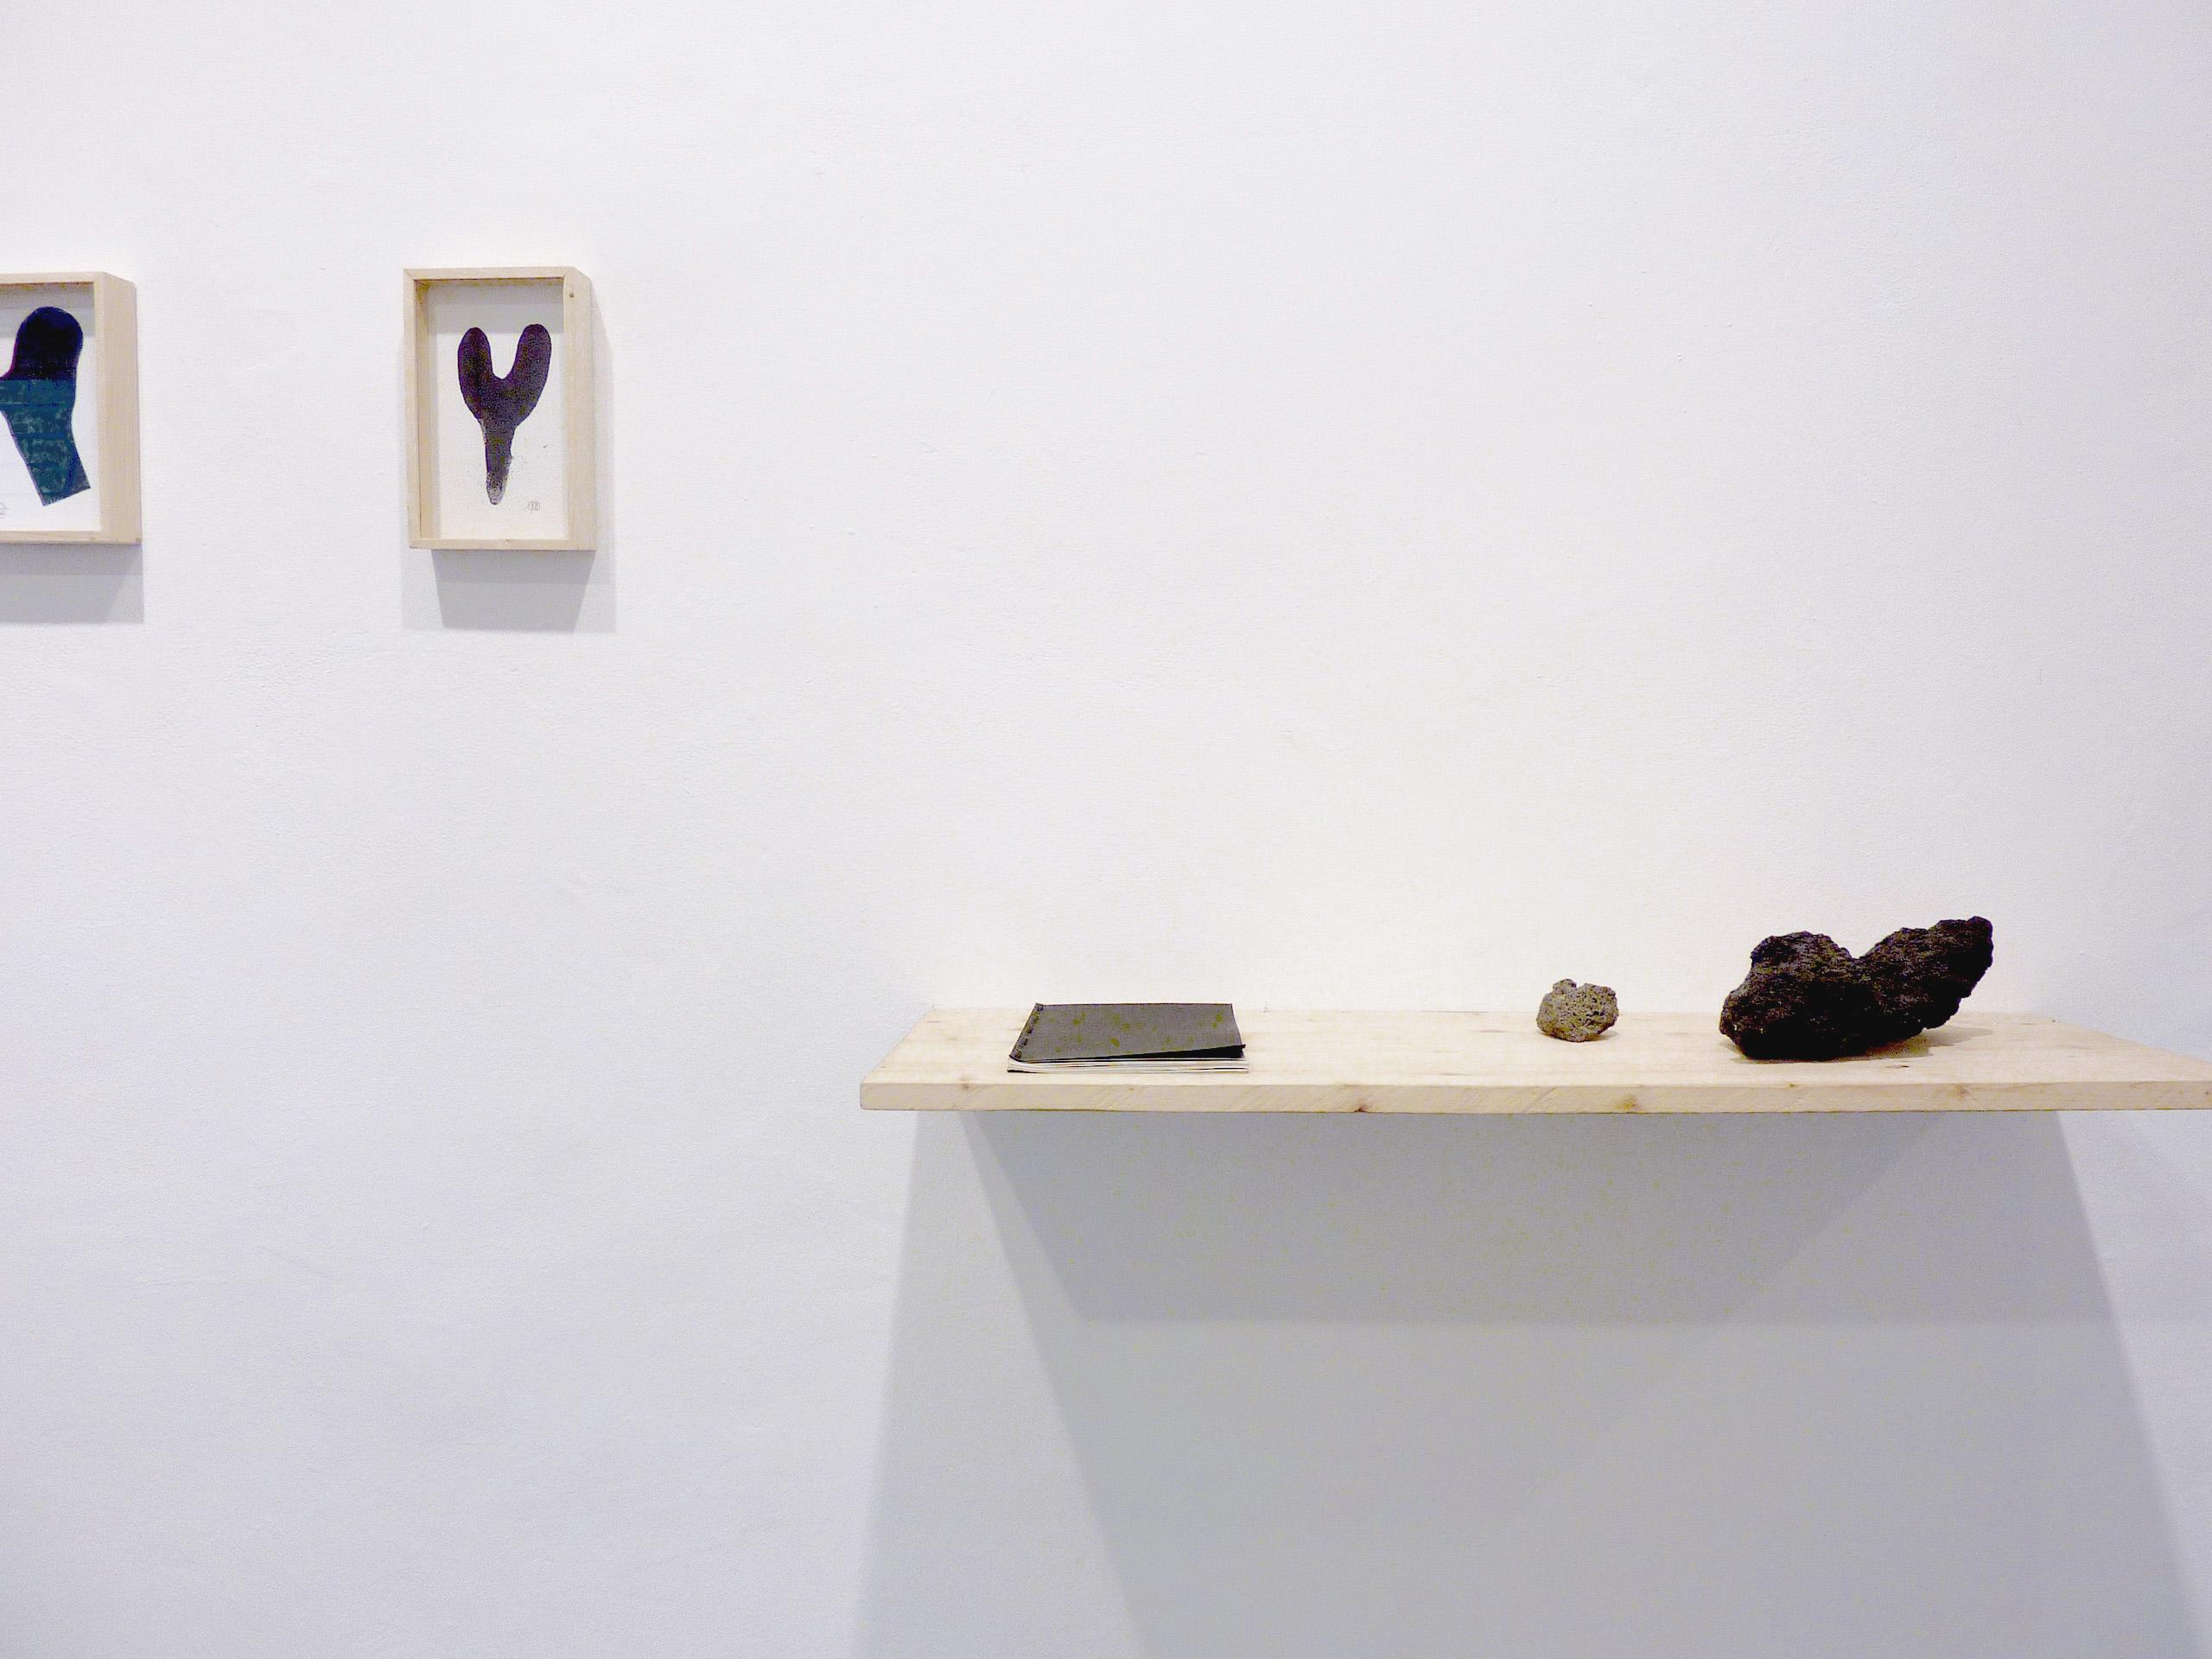 108-lava-at-van-der-gallery-recap-04